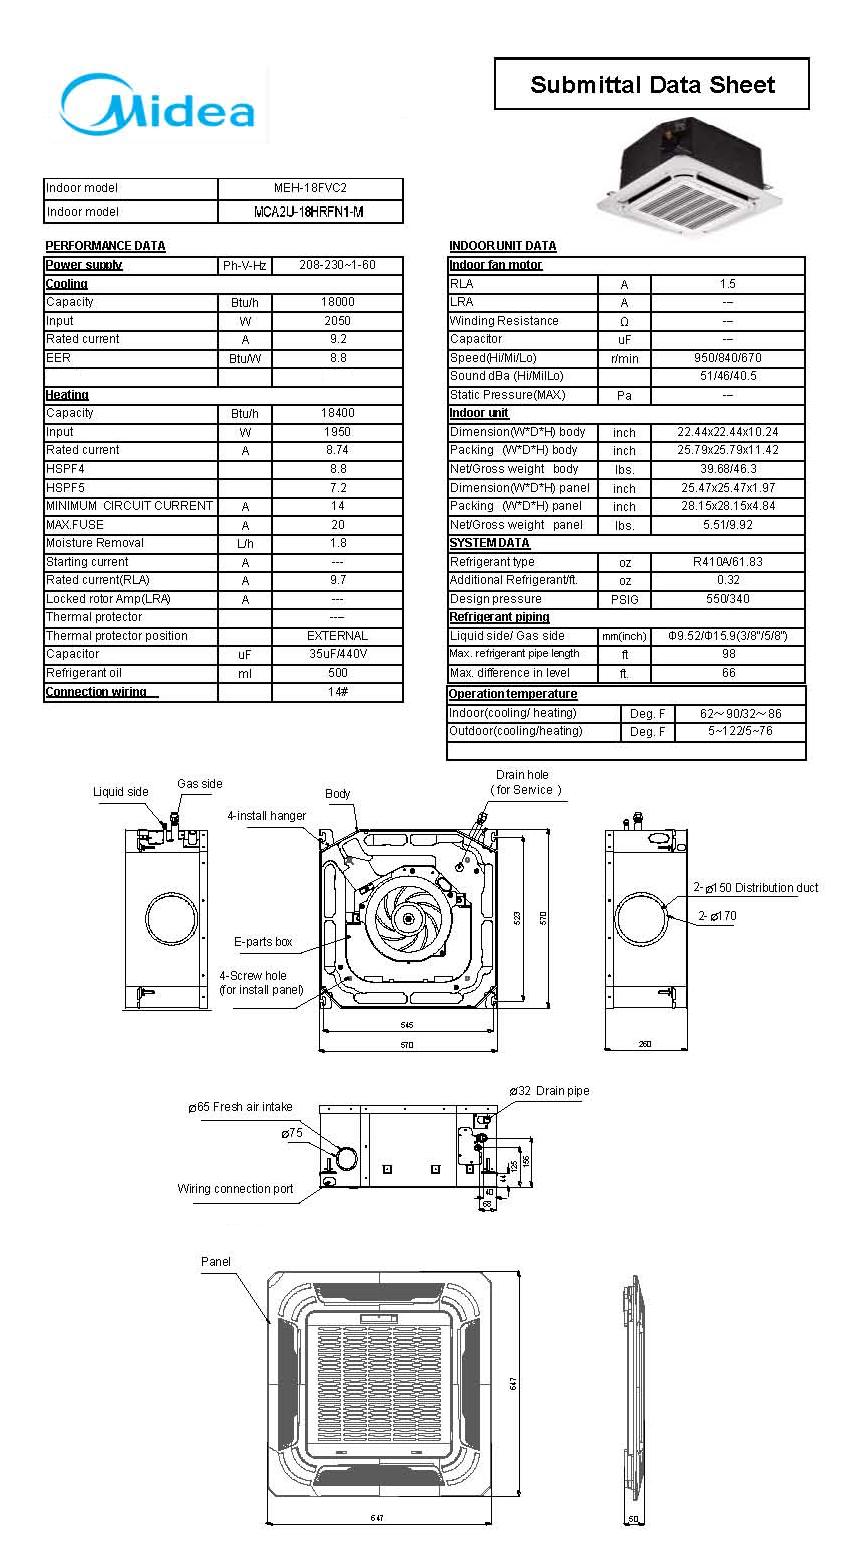 daikin mini split diagram imageresizertool com. Black Bedroom Furniture Sets. Home Design Ideas